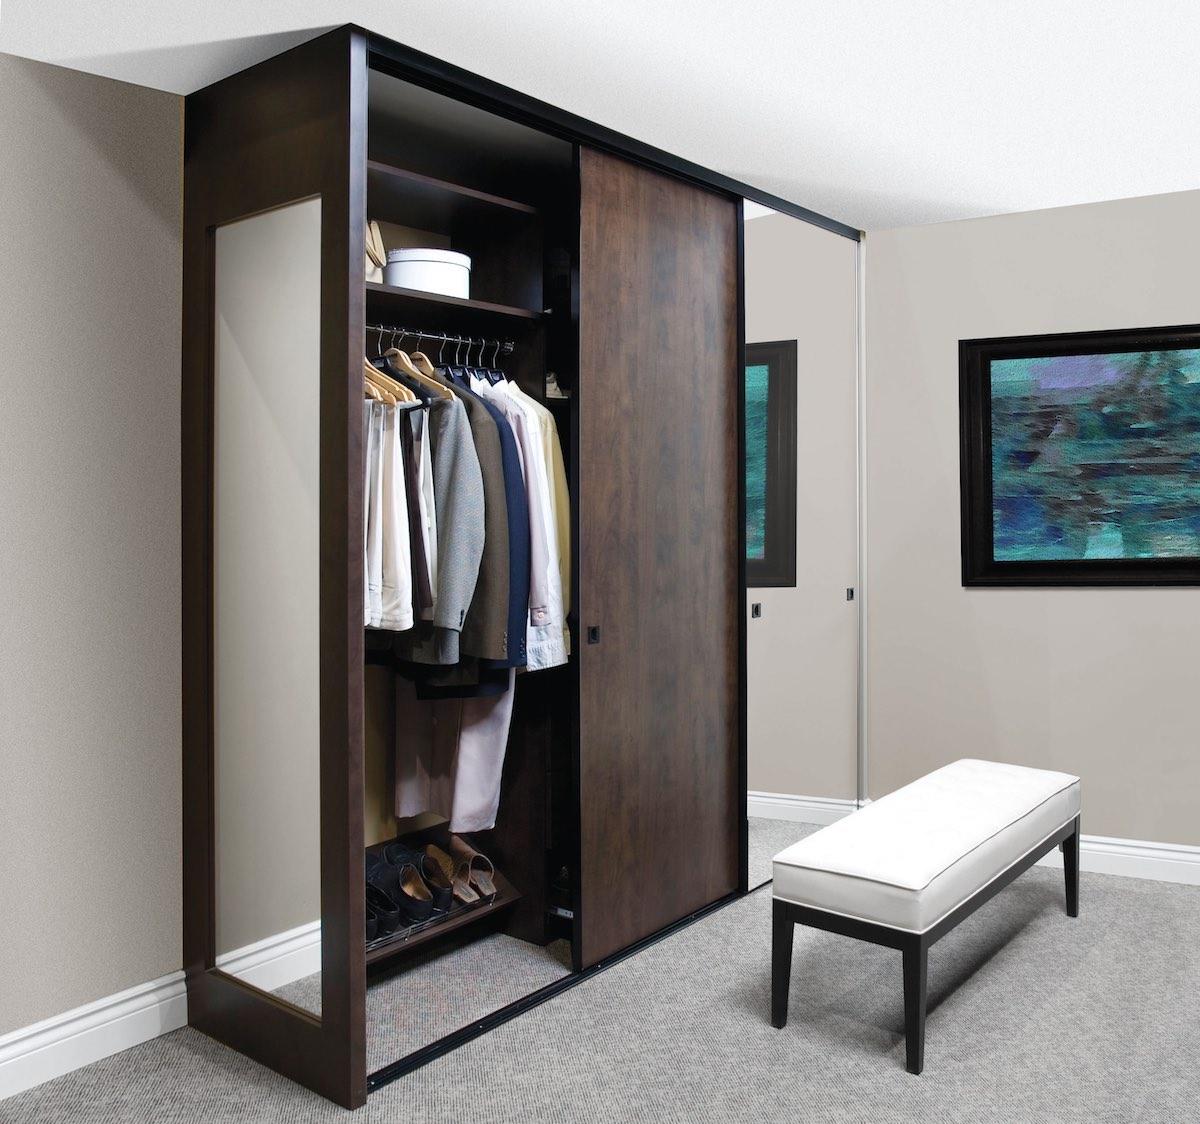 shared closet, create-a-closet